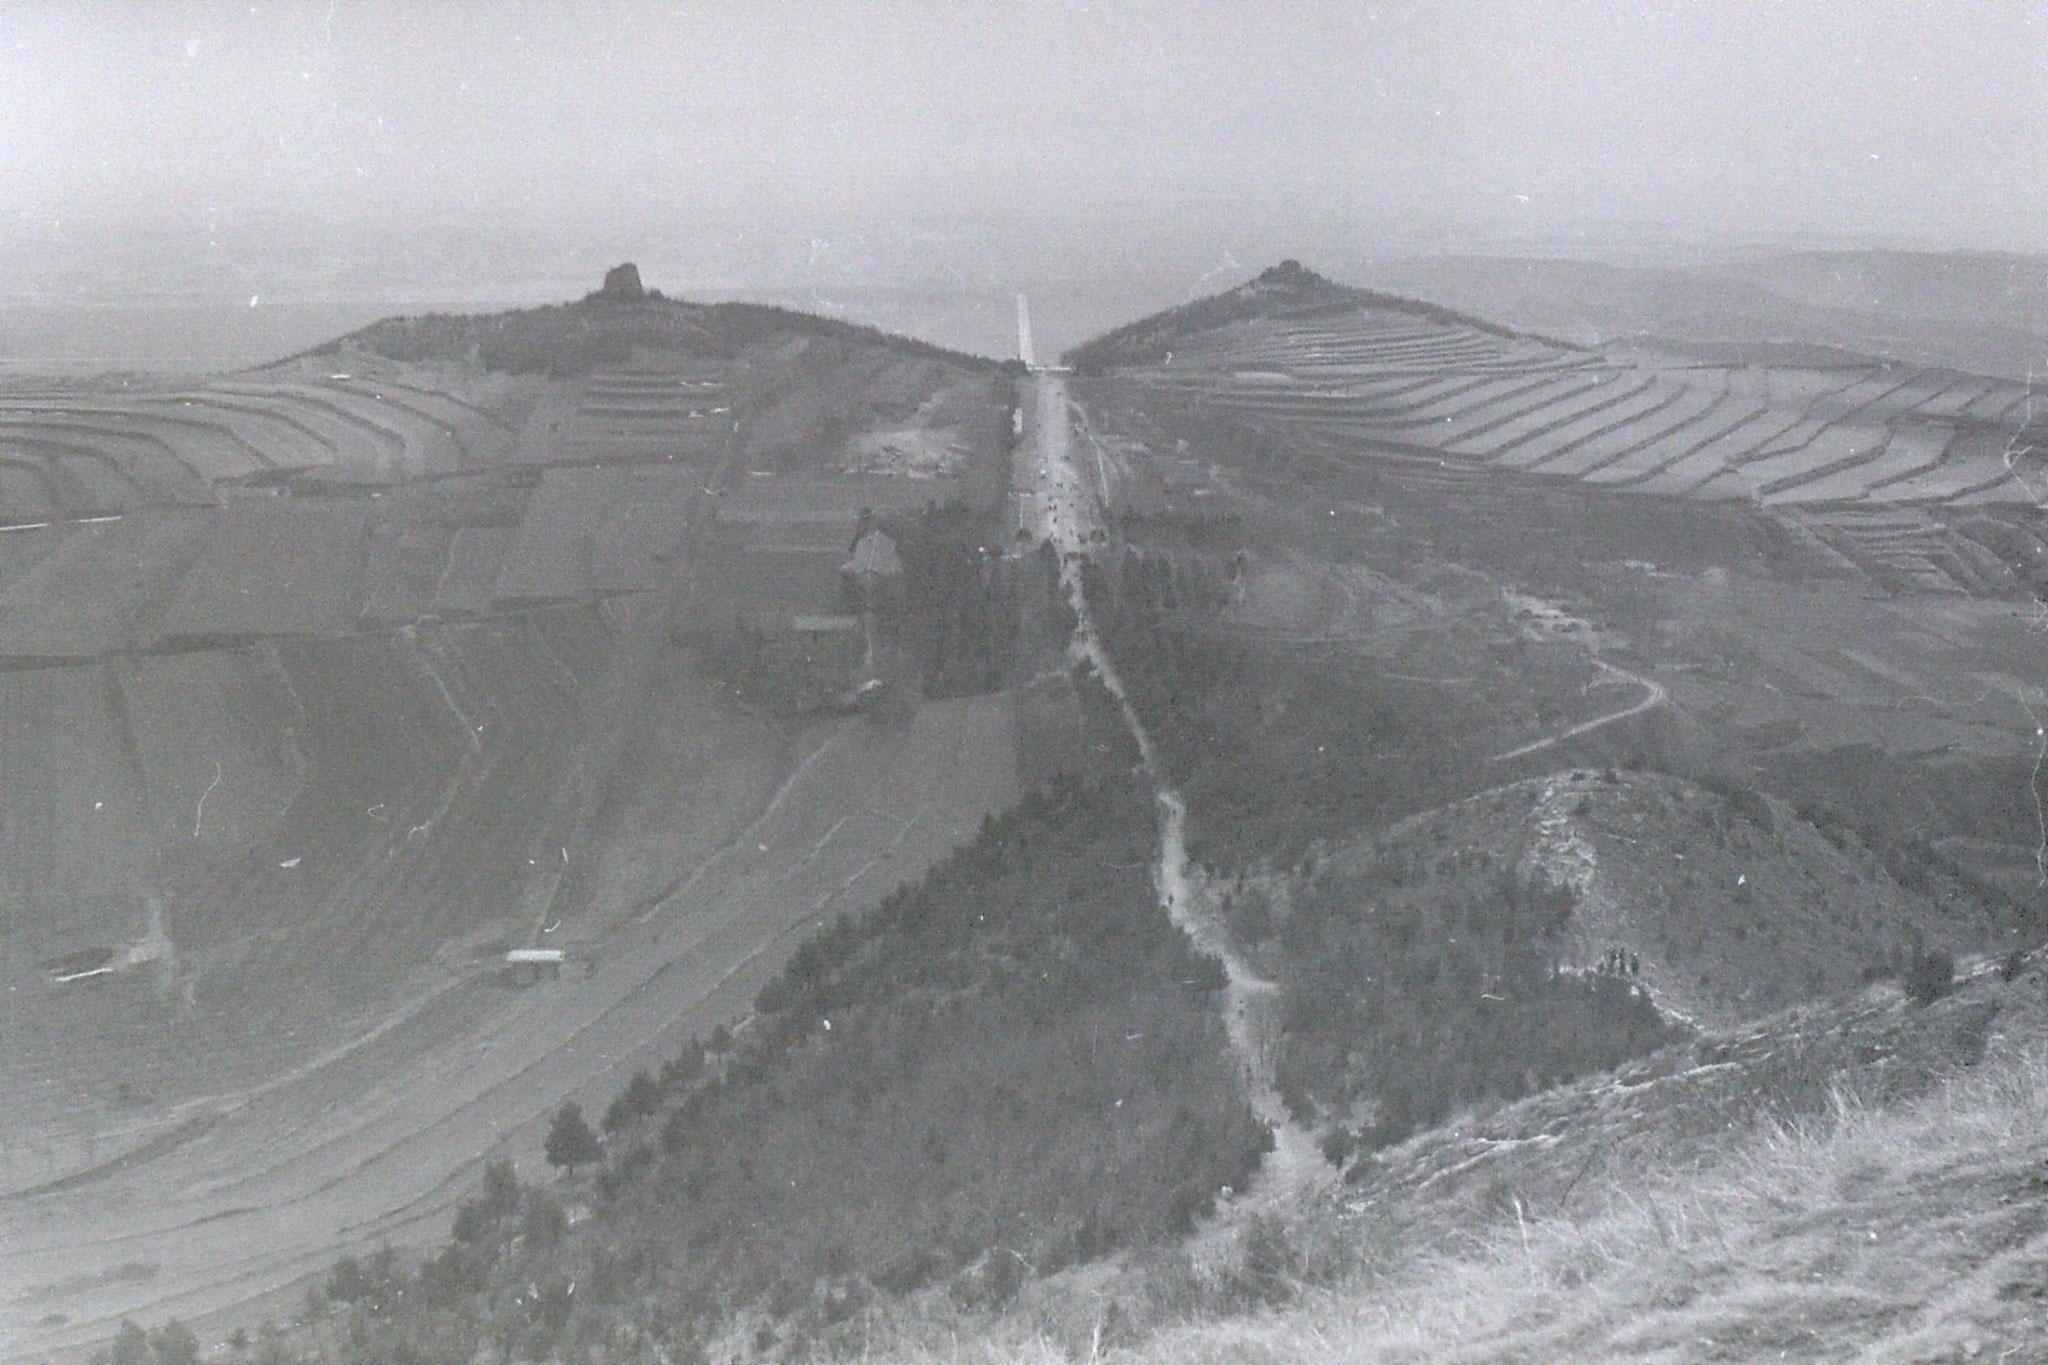 7/3/1989: 24: Xianyang tombs